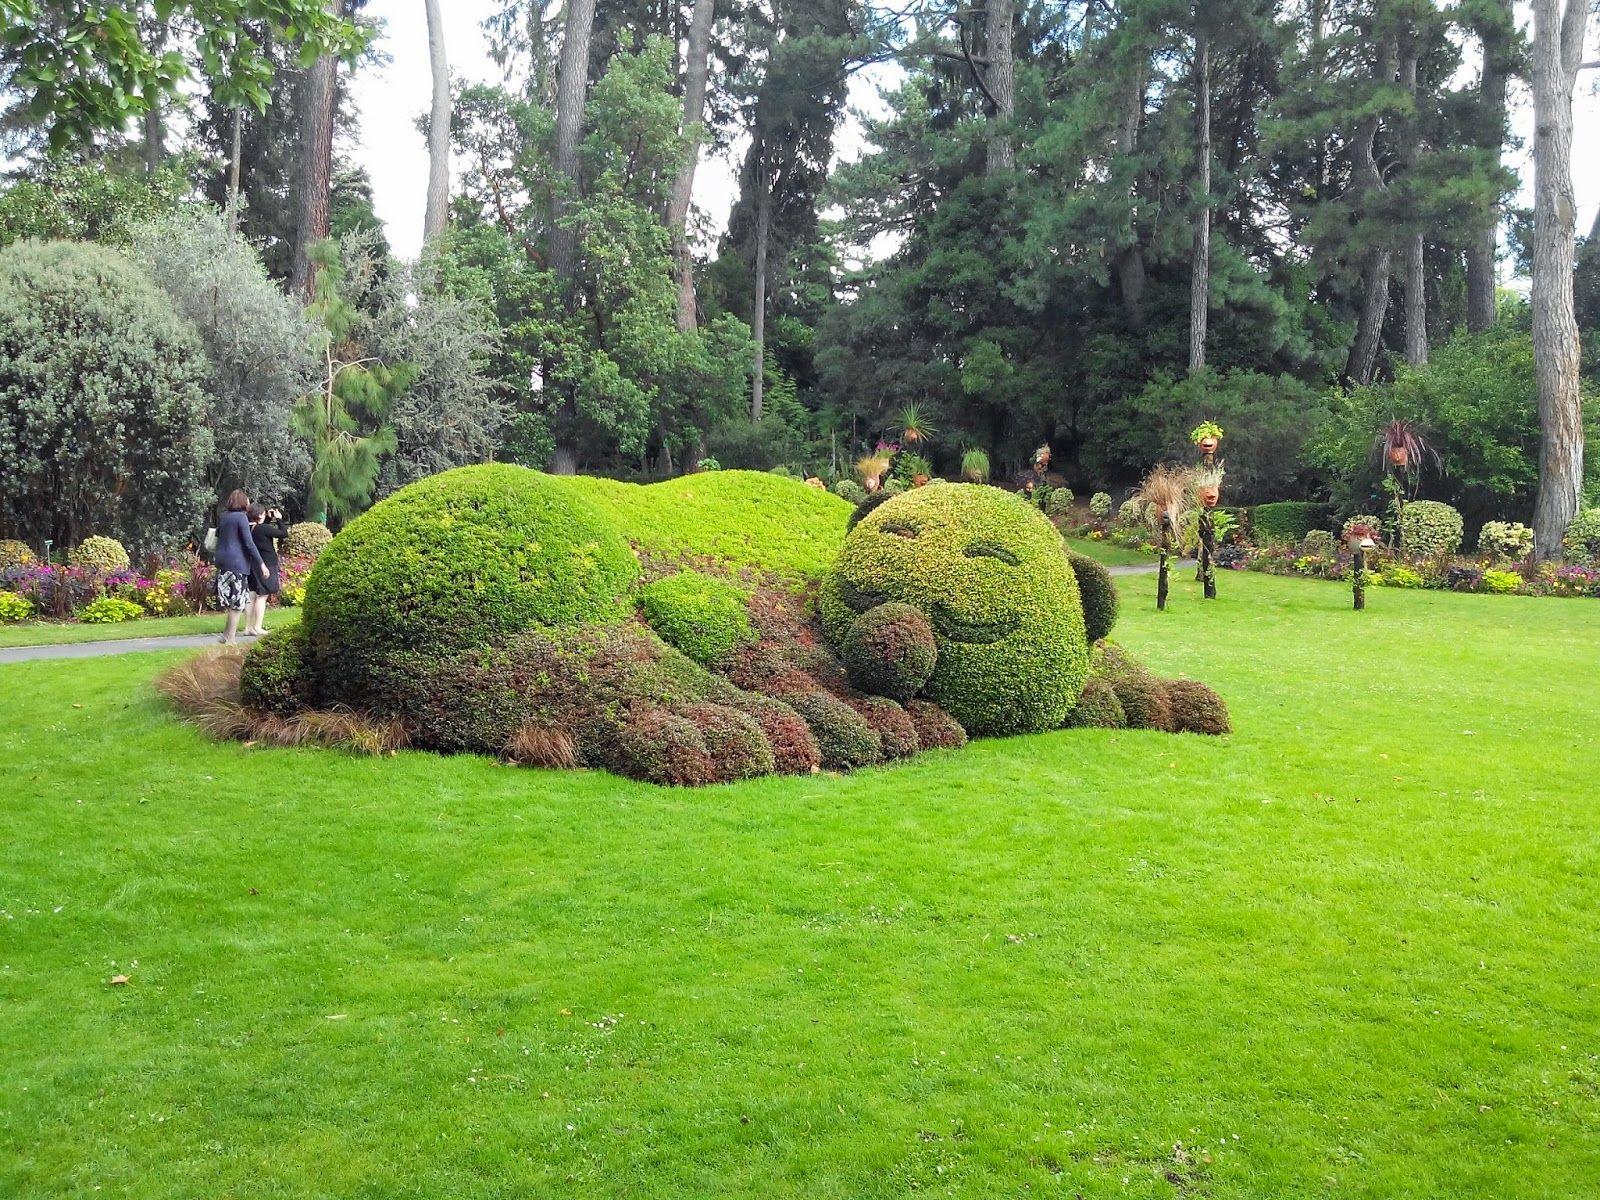 Claude Ponti Jardin Des Plantes Nantes